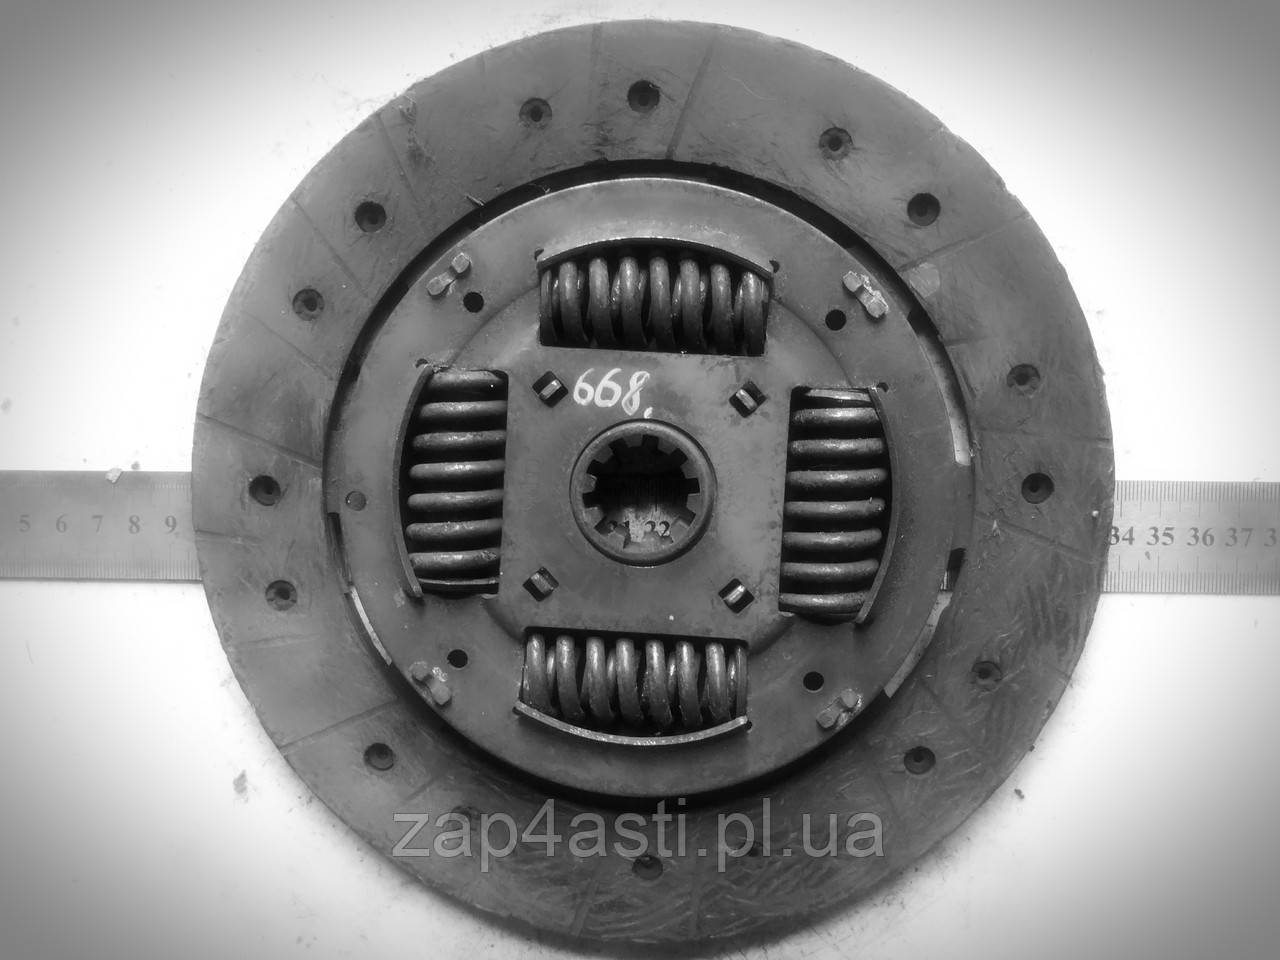 Диск сцепления на Fiat Croma Lancia Thema 1.9TD 2.5TD 83-97 323020816